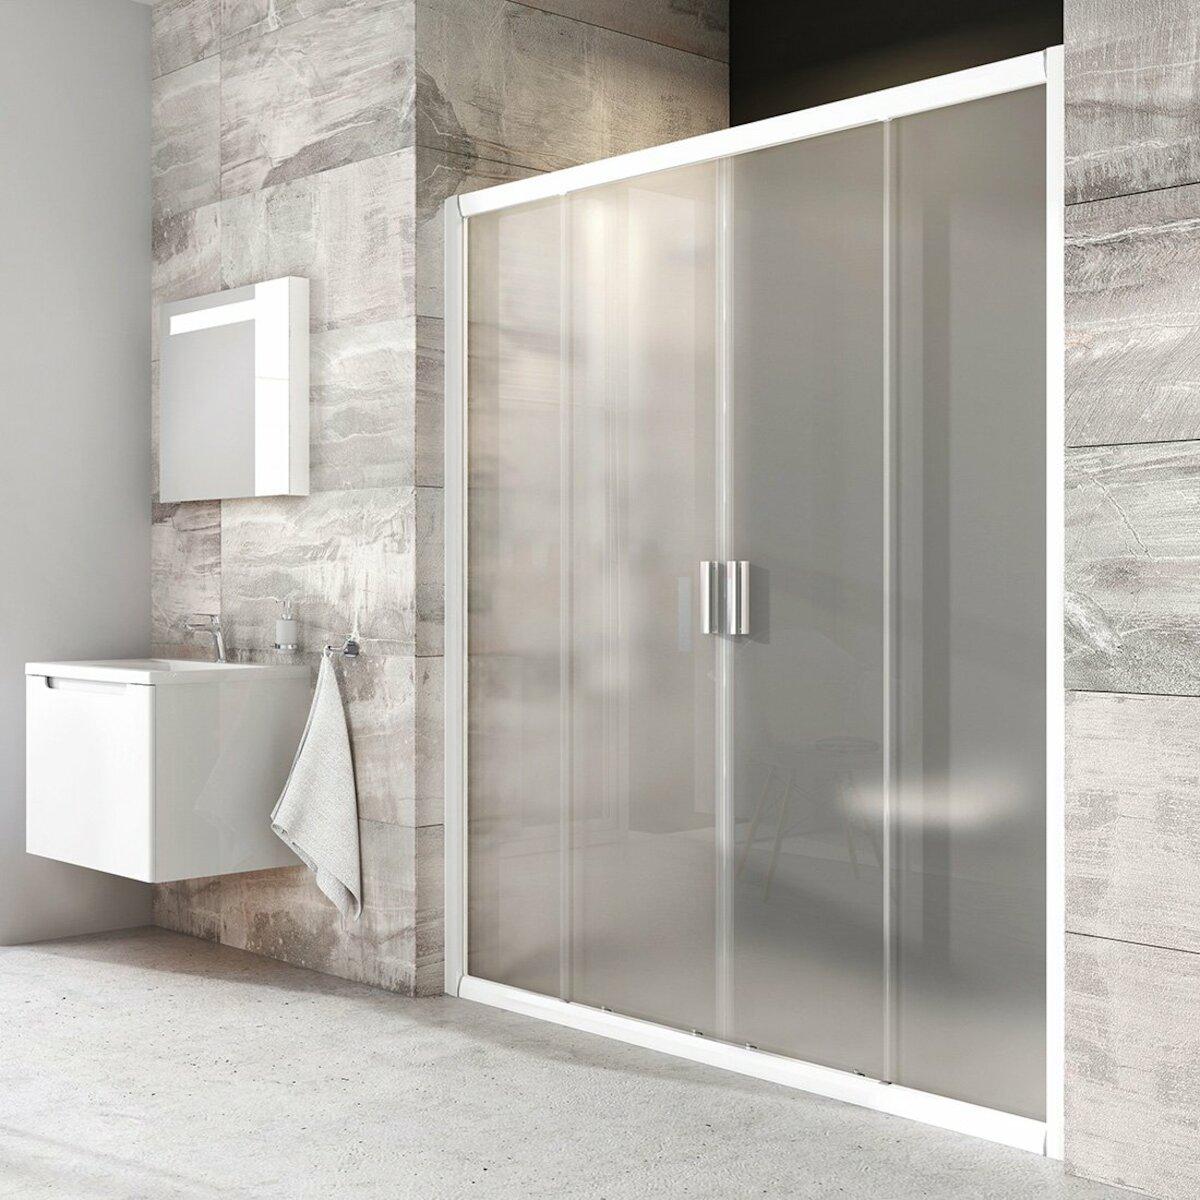 Sprchové dvere 190x190 cm Ravak Blix biela 0YVL0100ZG